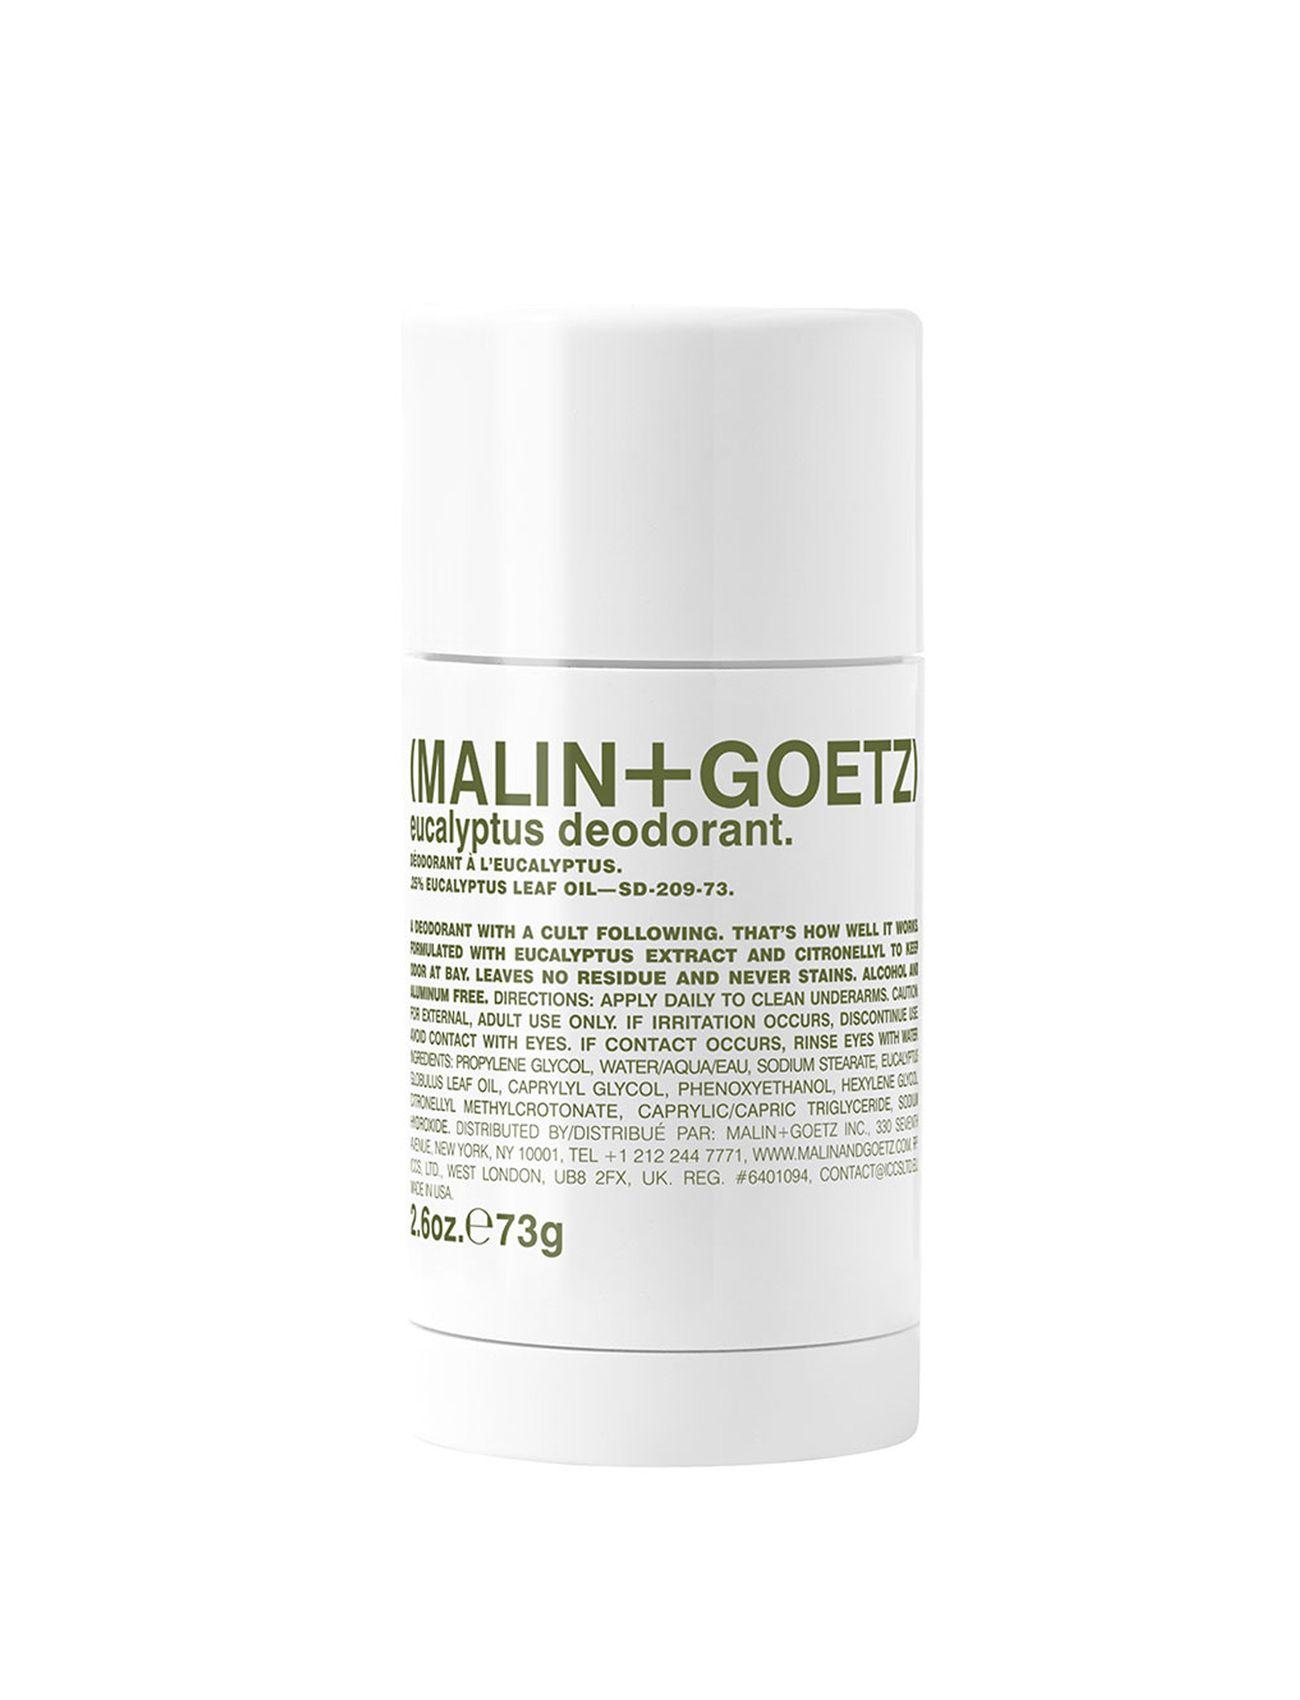 malin+goetz – Eucalyptus deodorant fra boozt.com dk